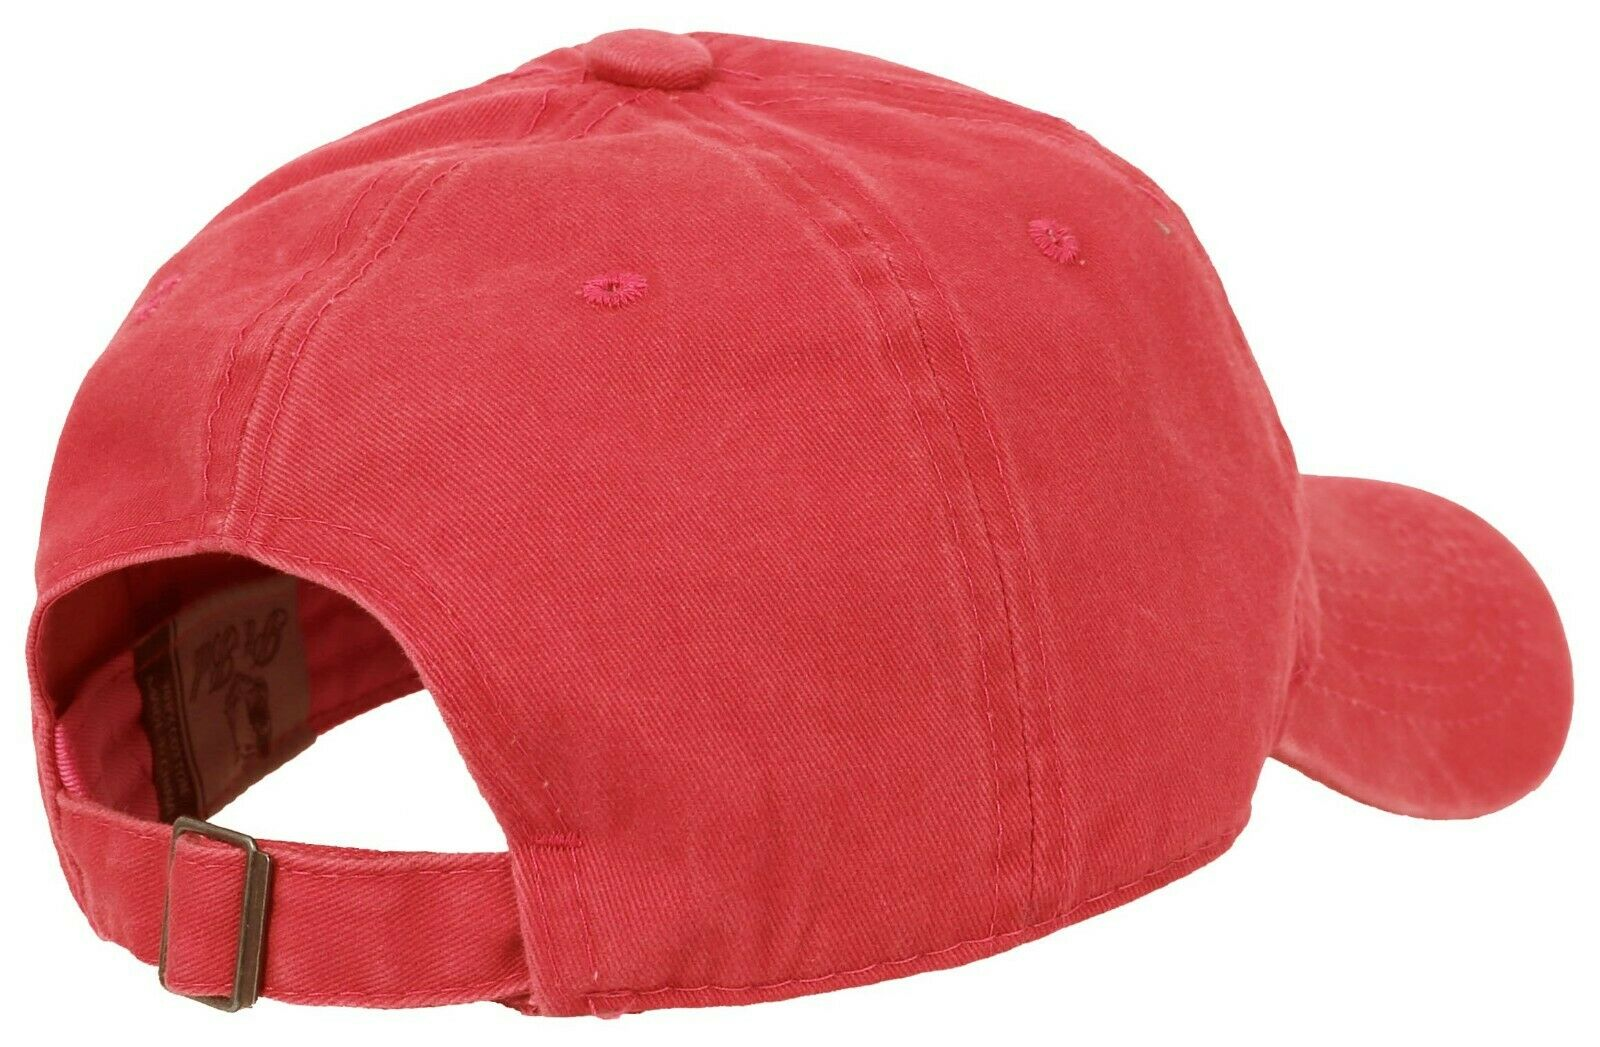 BASEBALL-CAP-Plain-Dad-Hat-Low-Profile-Vintage-Washed-Pigment-Adjustable thumbnail 17